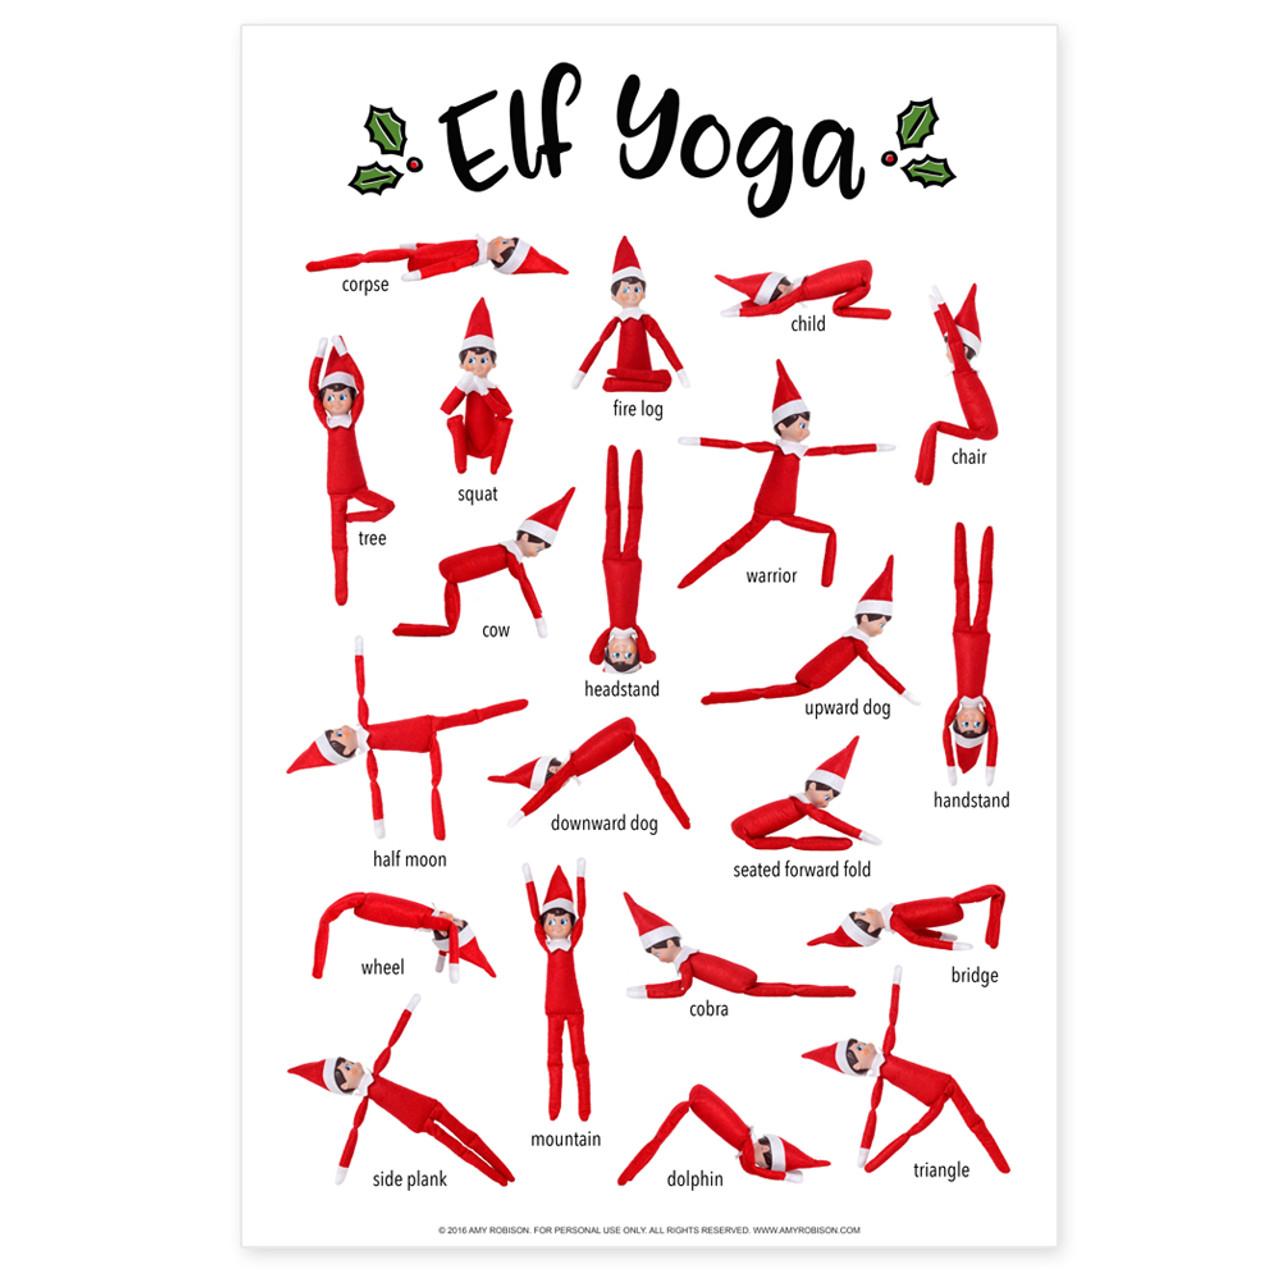 picture regarding Printable Poster identified as Elf Yoga Poster Printable